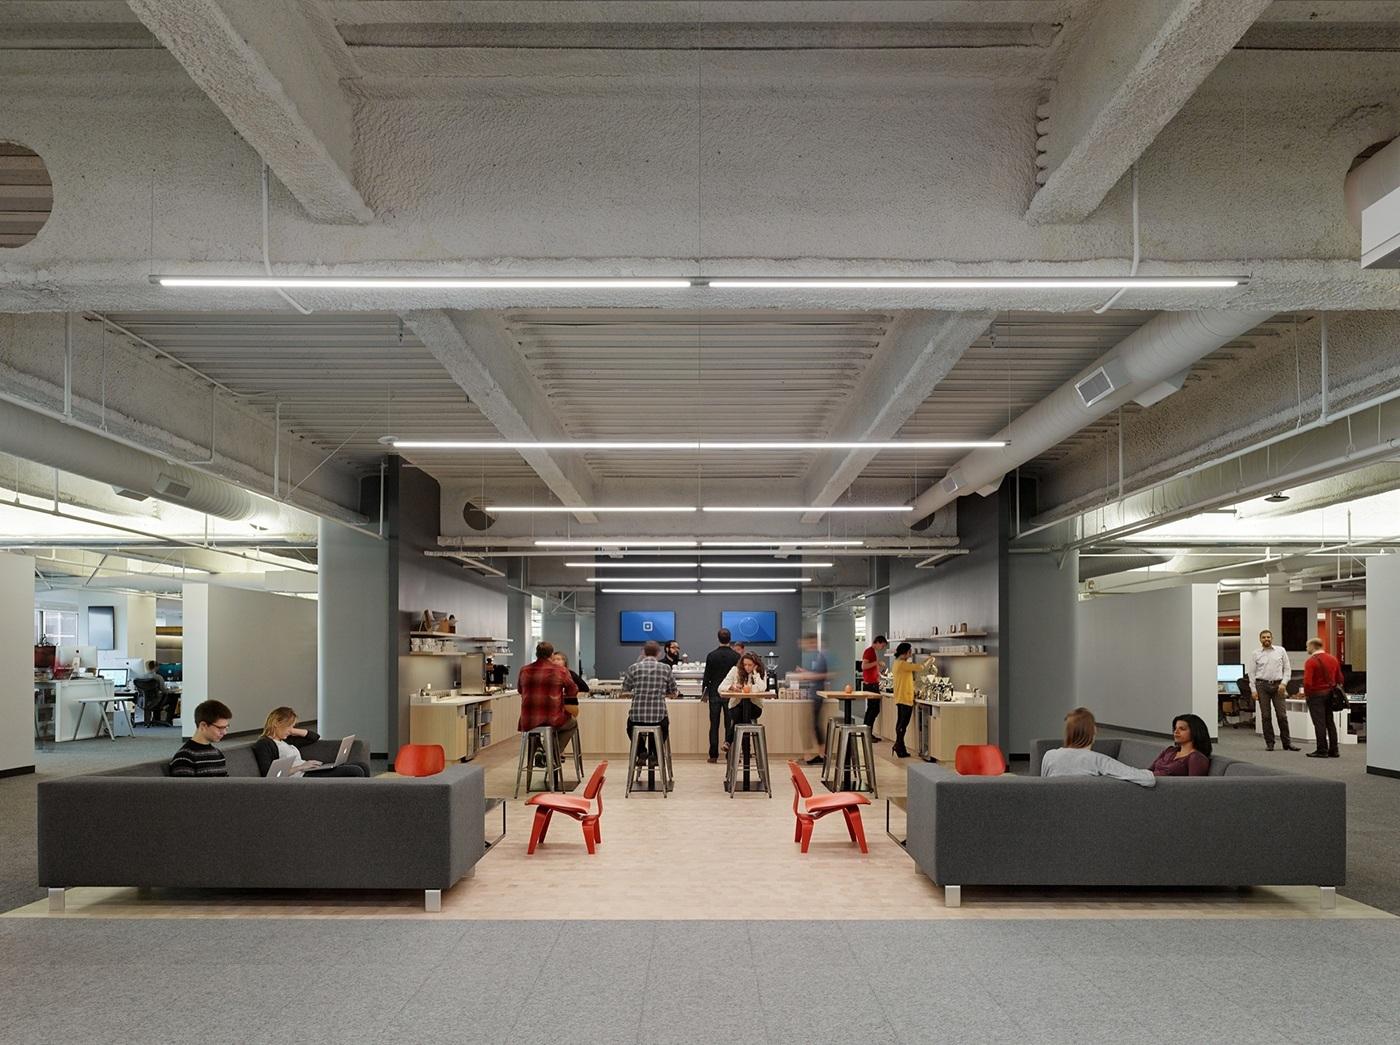 A Look Inside Squares San Francisco Headquarters